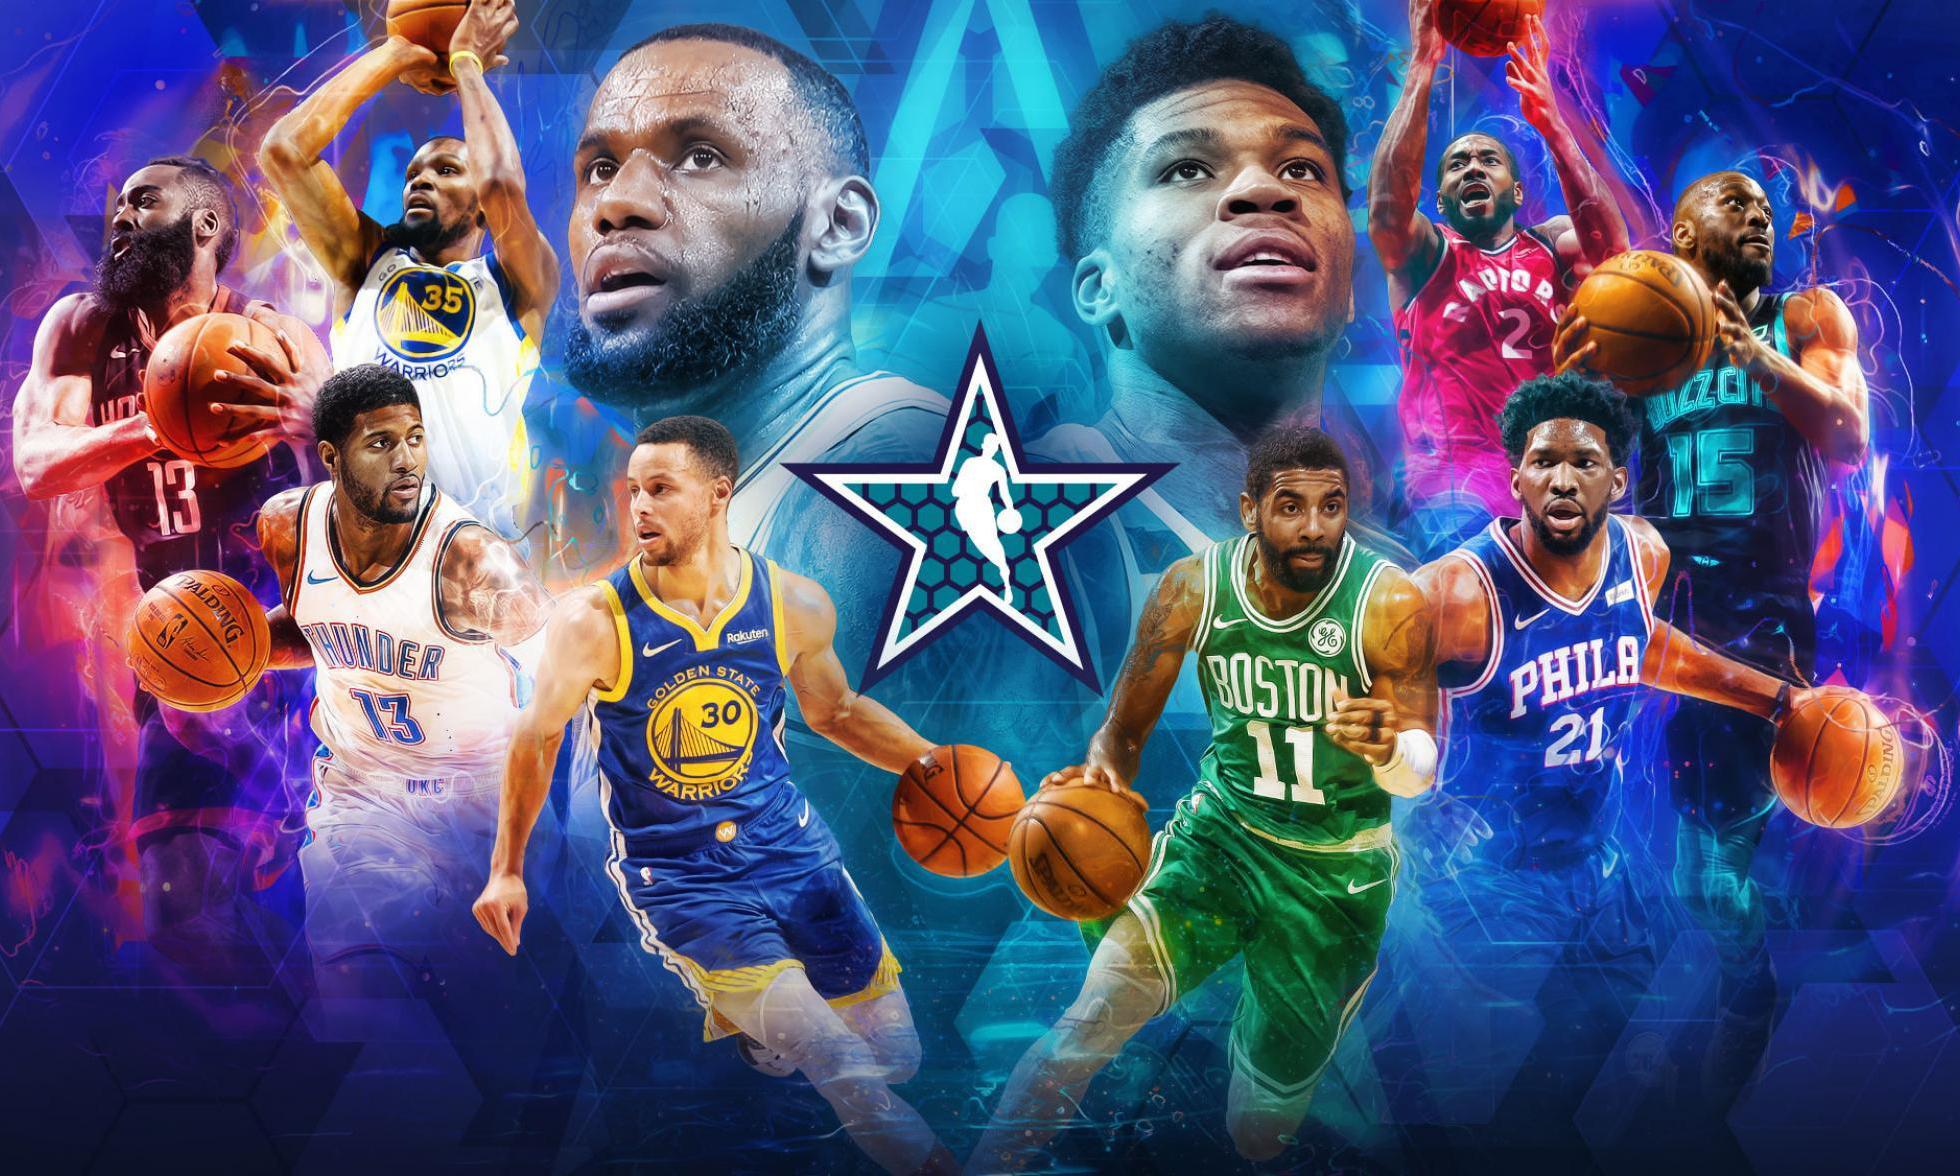 NBA 2019 全明星赛先发名单公布,罗斯与东契奇遗憾落选